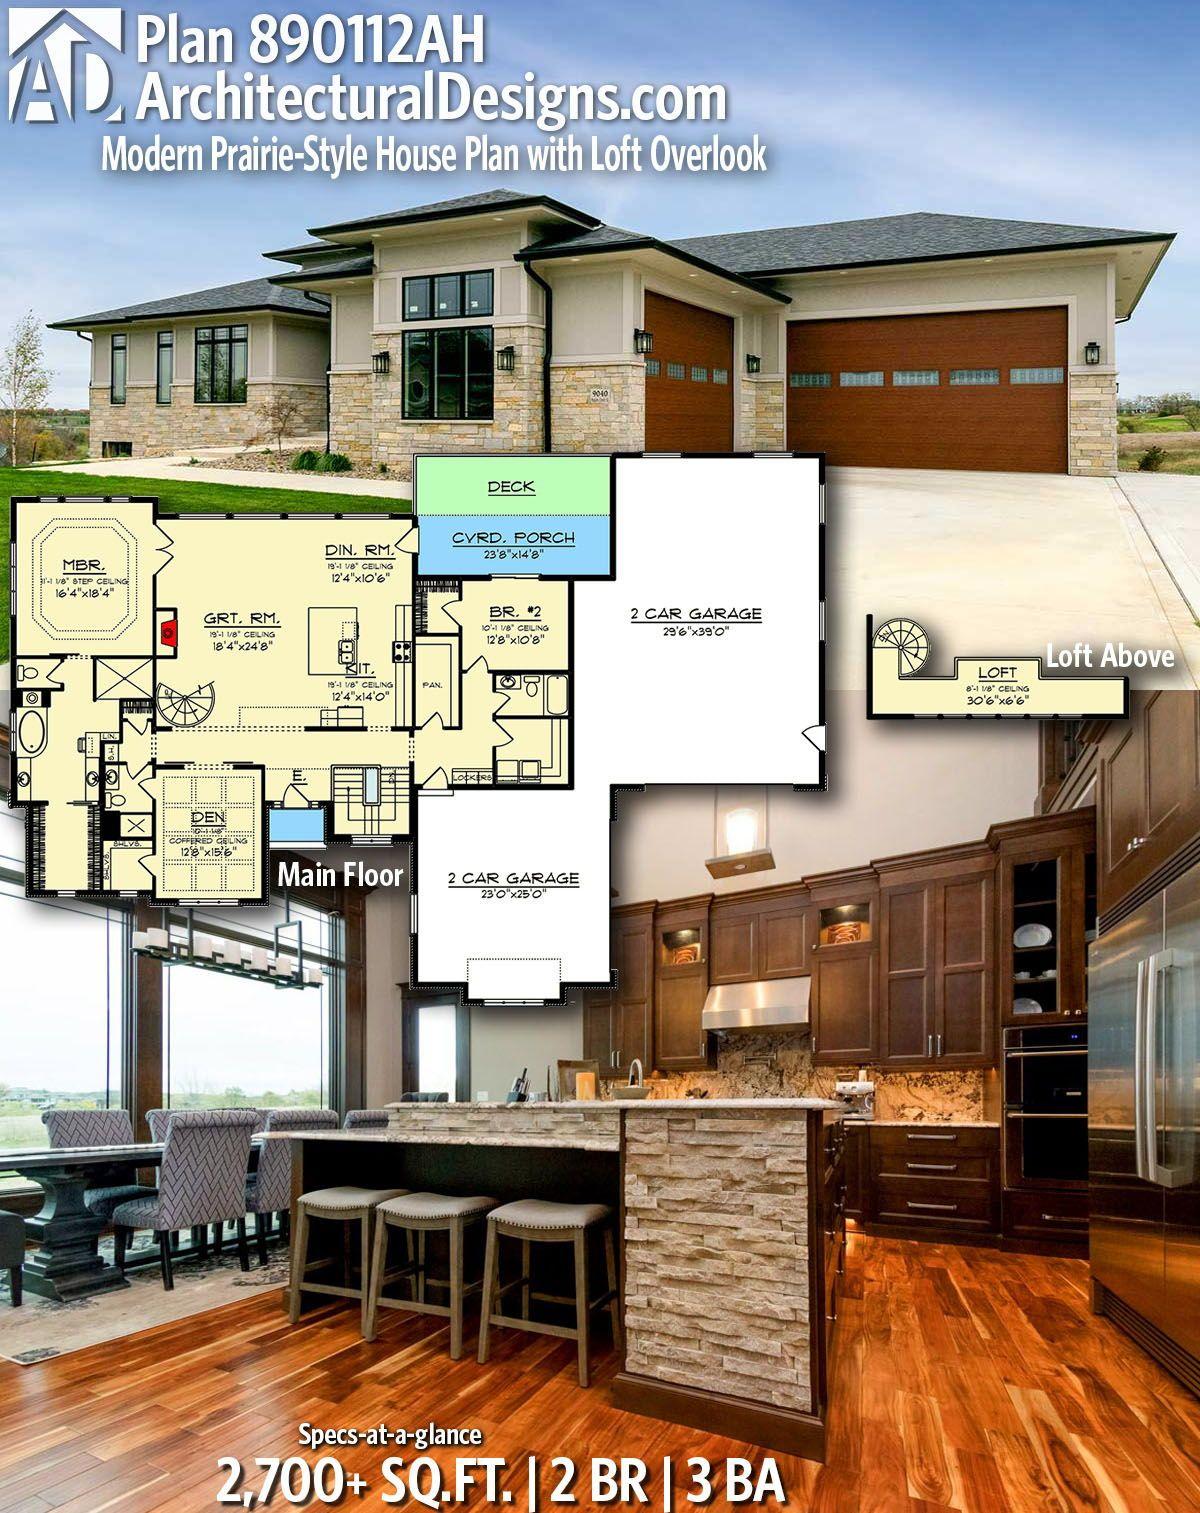 Plan 890112ah Modern Prairie Style House Plan With Loft Overlook In 2020 Prairie Style Houses Modern House Plans House Plan With Loft